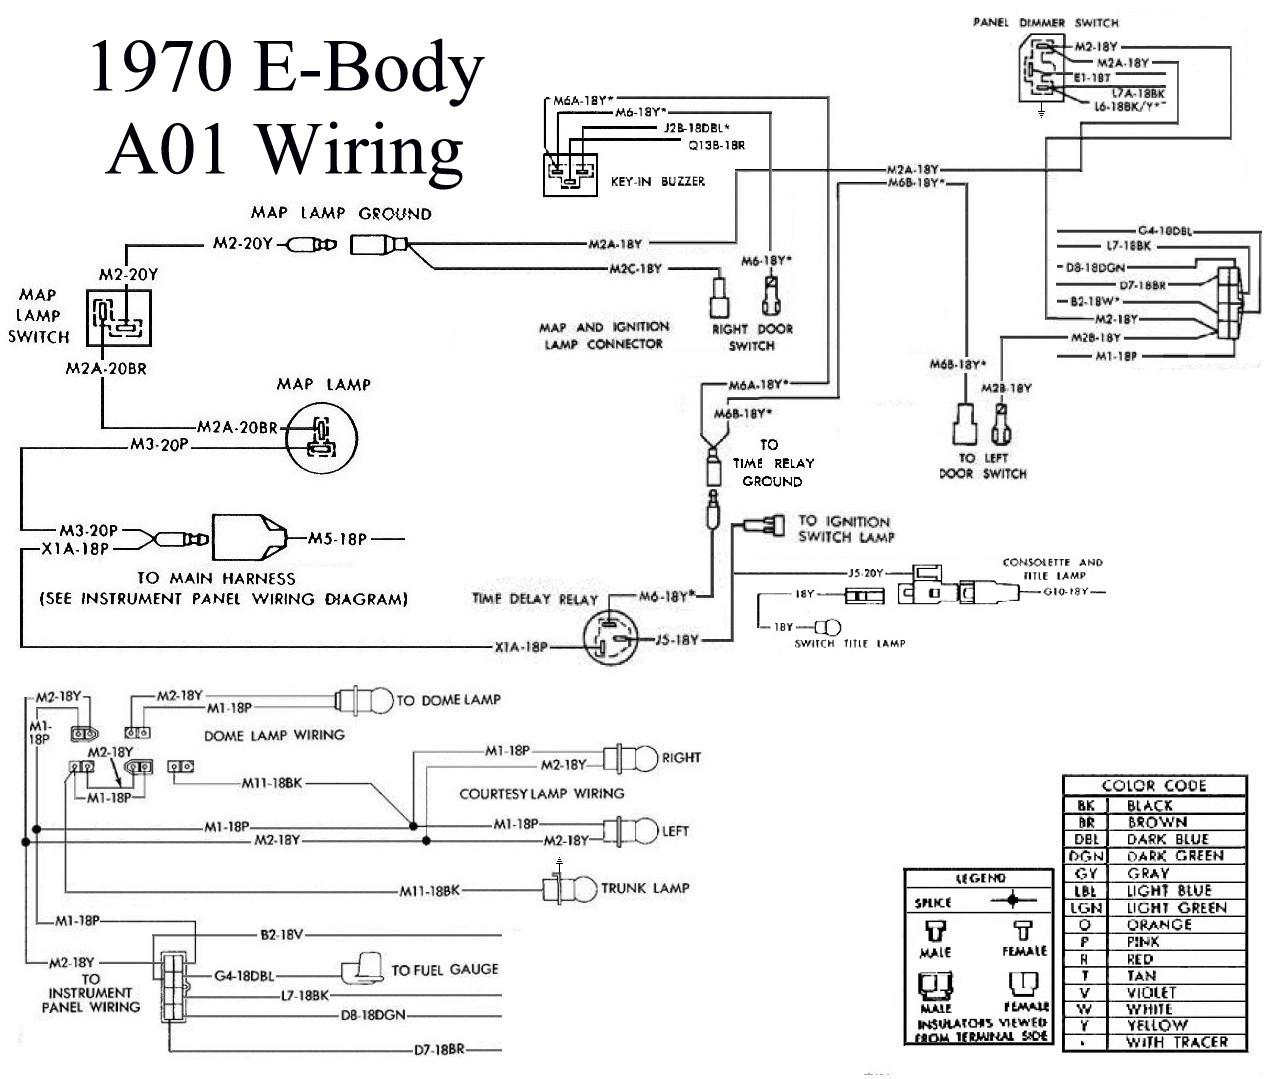 Need Photo 70 E Body Backside Of Dash Please Moparts Restoration M880 Wiring Diagram 5008091 Maplightwiringdash2